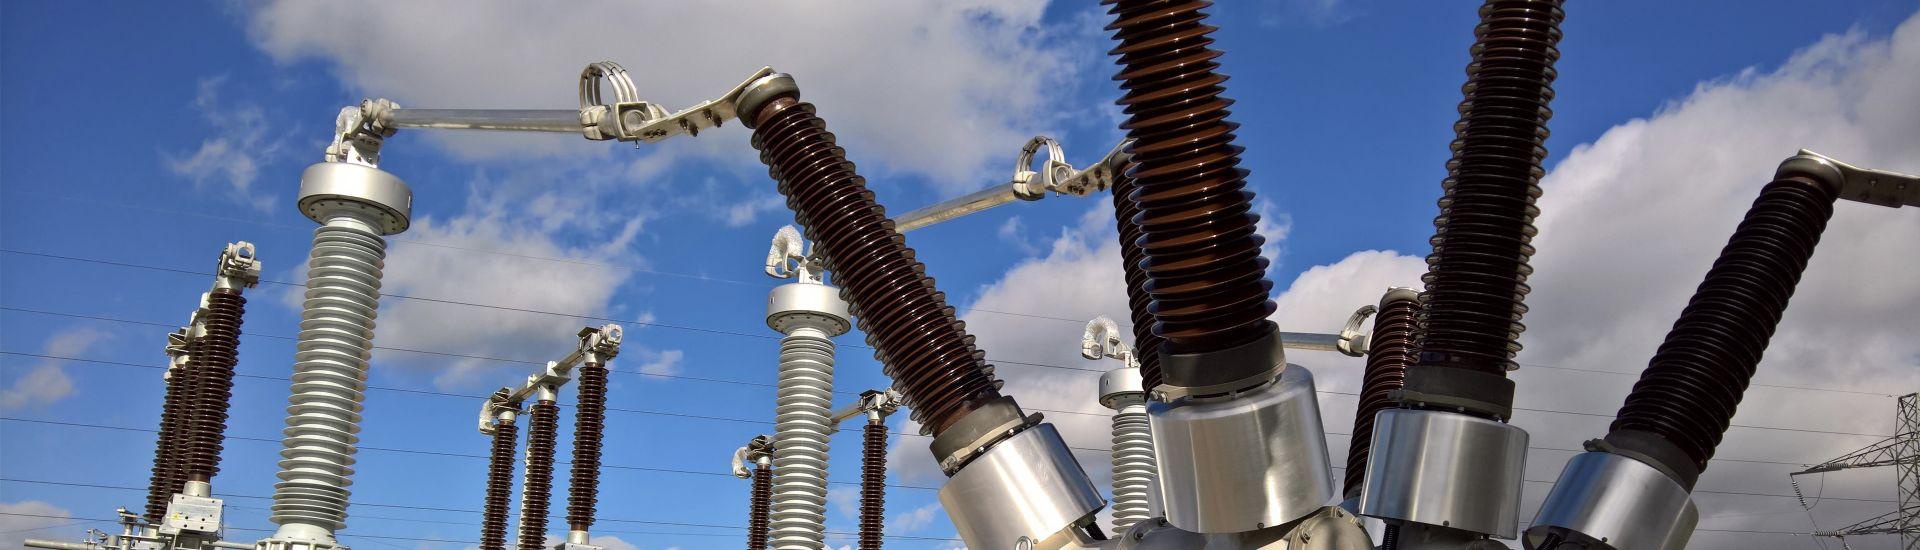 serv-high-voltage-electrical-infrastructure-banner.jpg